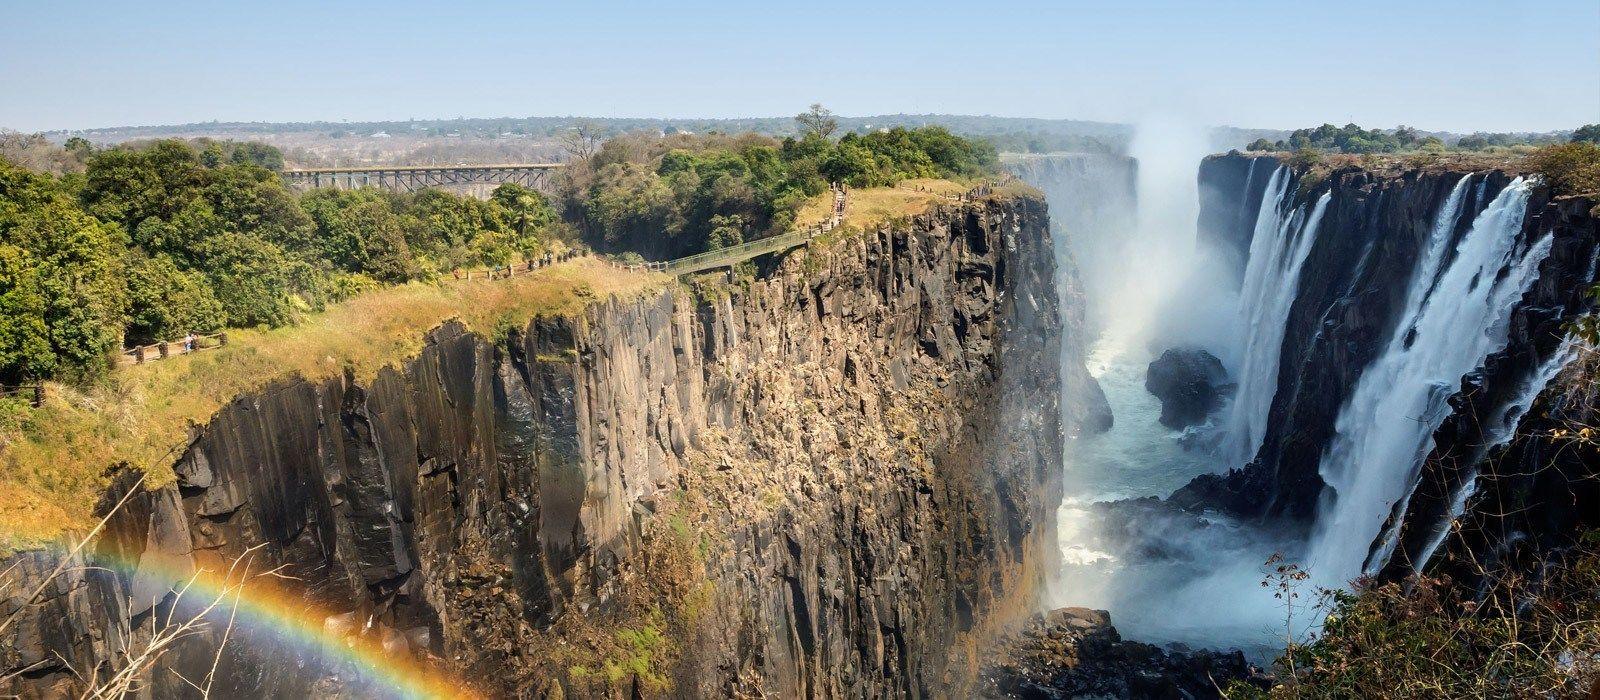 Cape, Kruger & Victoria Falls Tour Trip 4